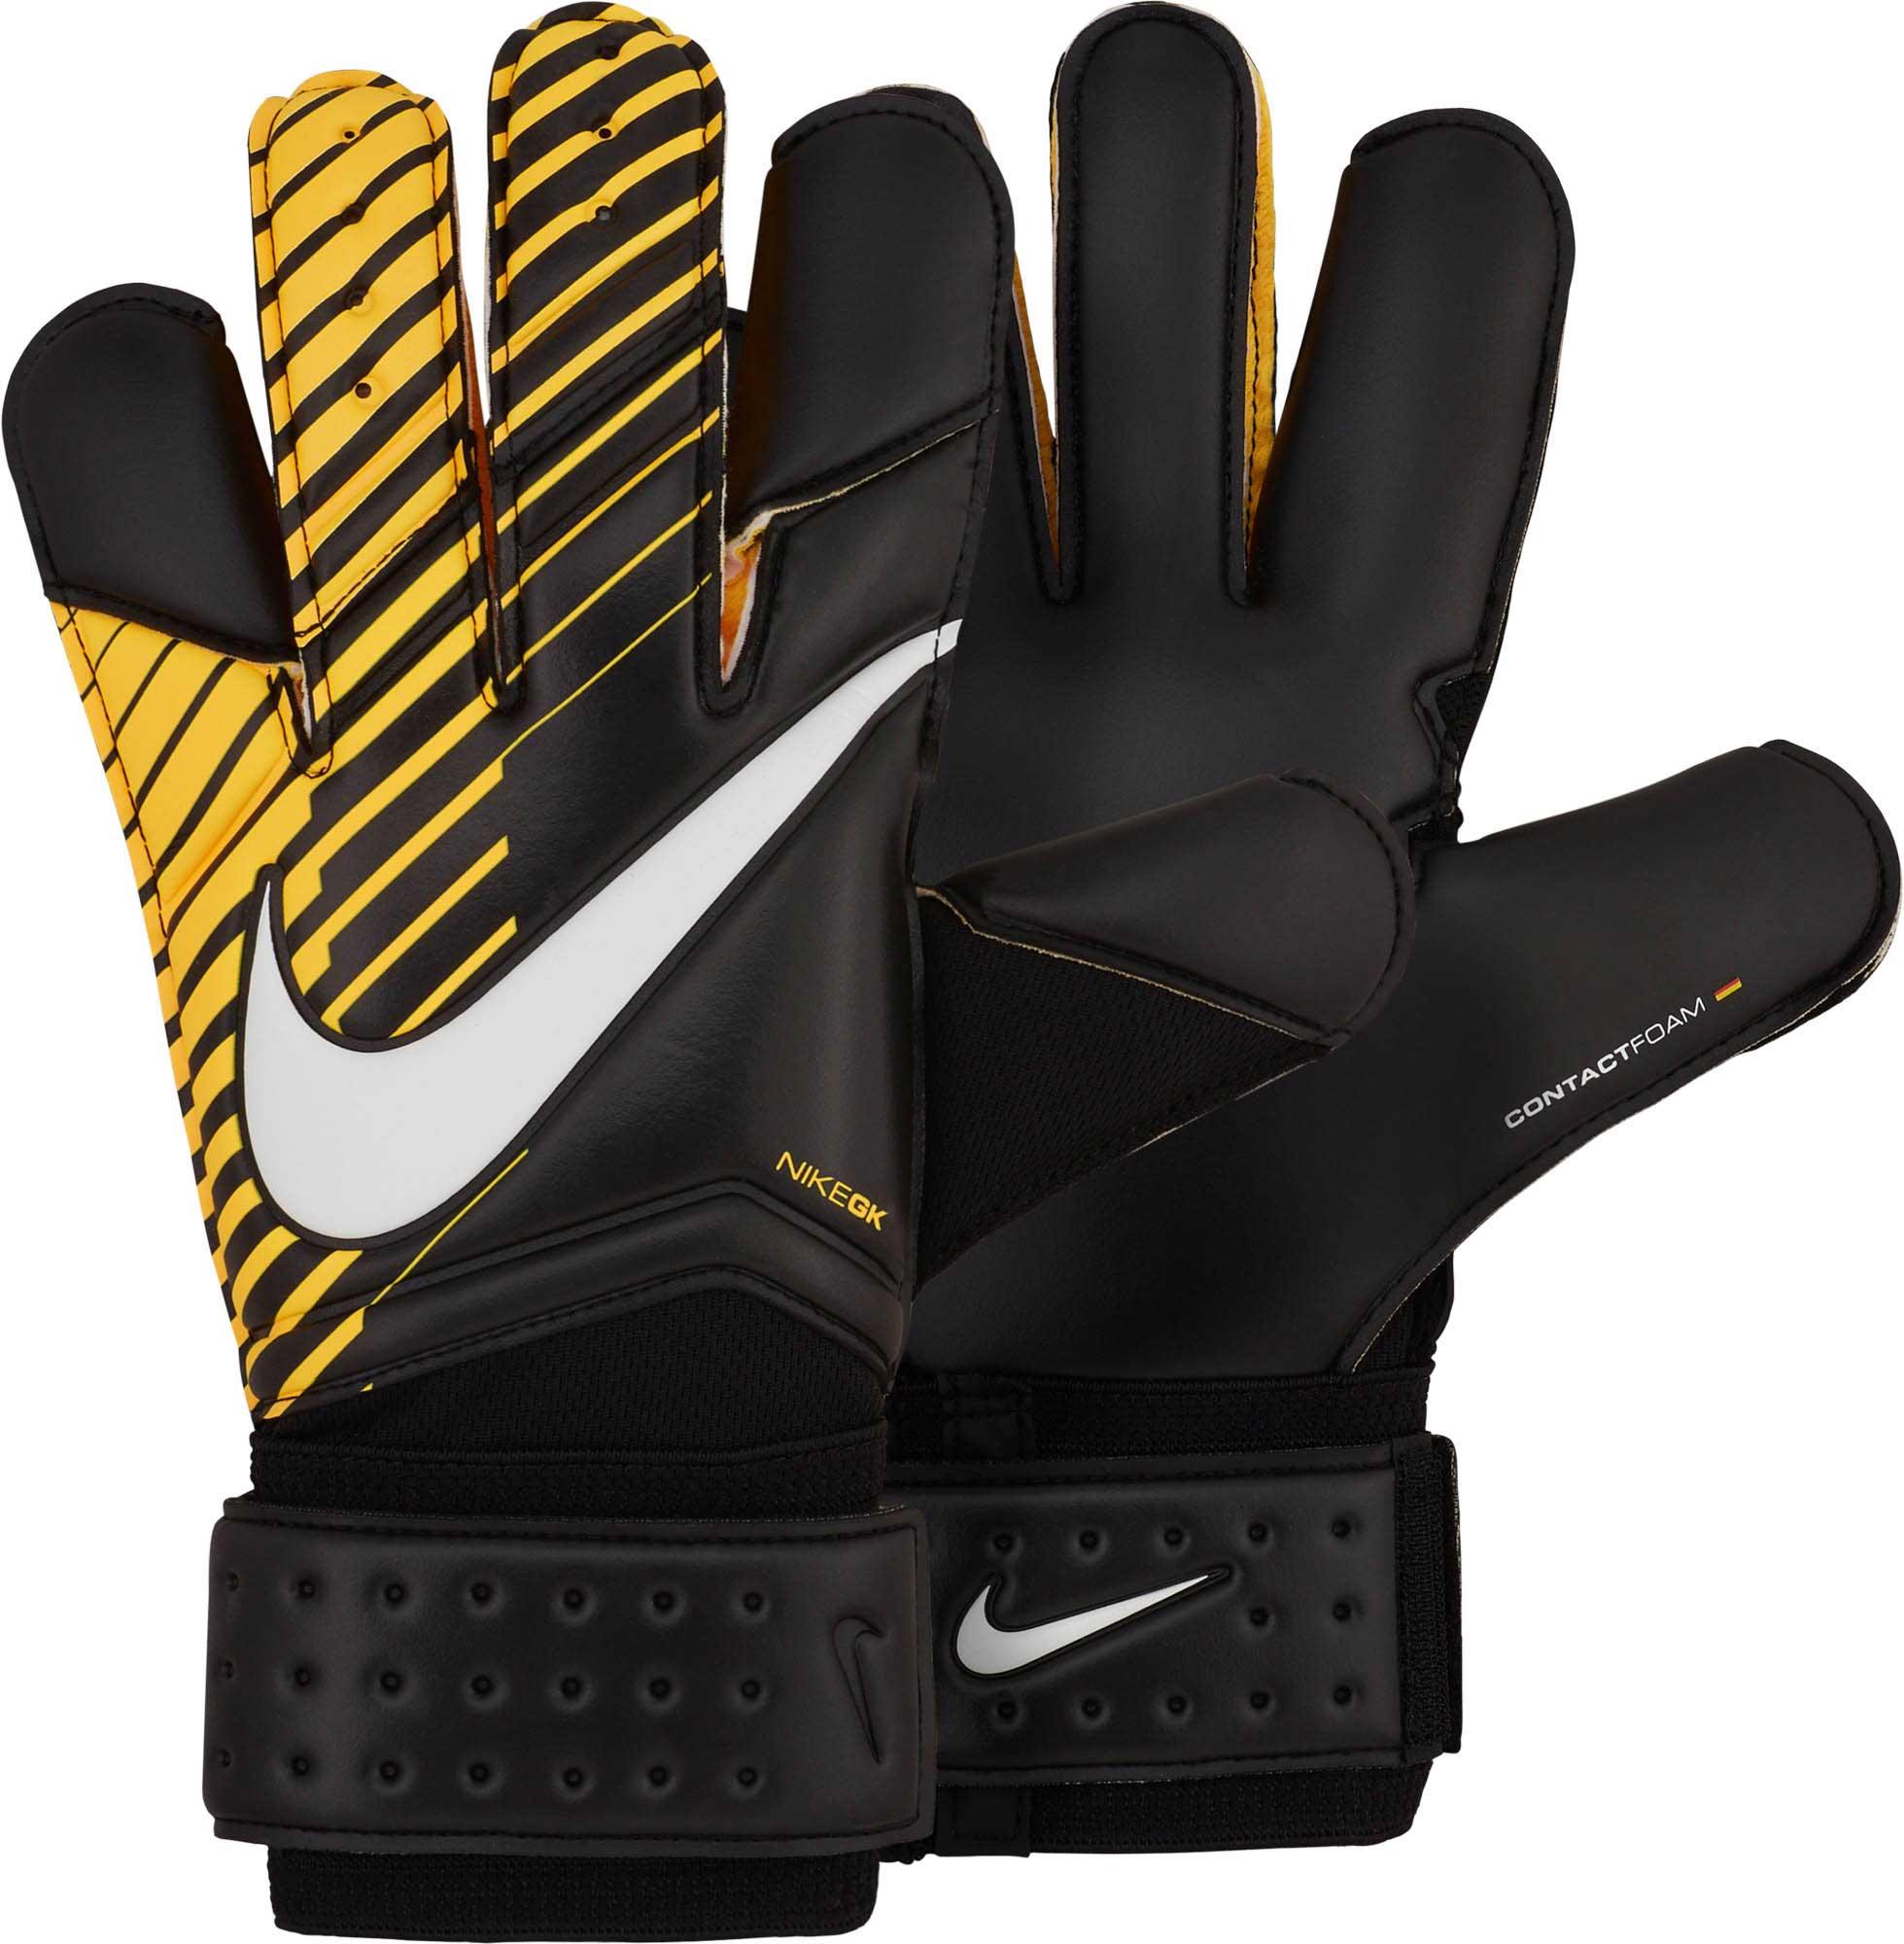 Nike Vapor Grip3 Goalkeeper Gloves Black & Laser Orange